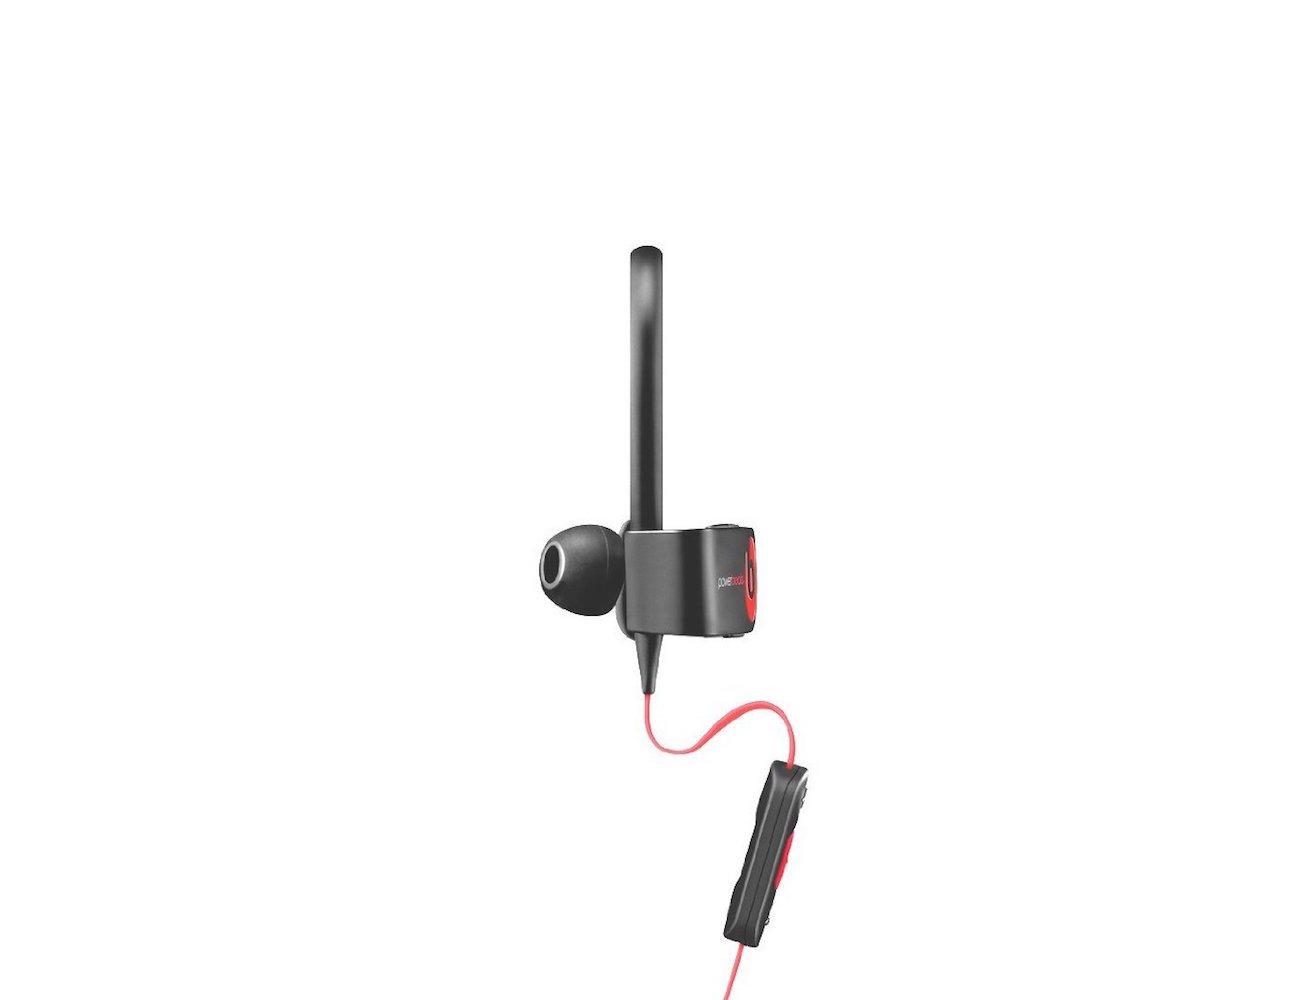 Apple Powerbeats2 in Apple Watch Sport Band Colors